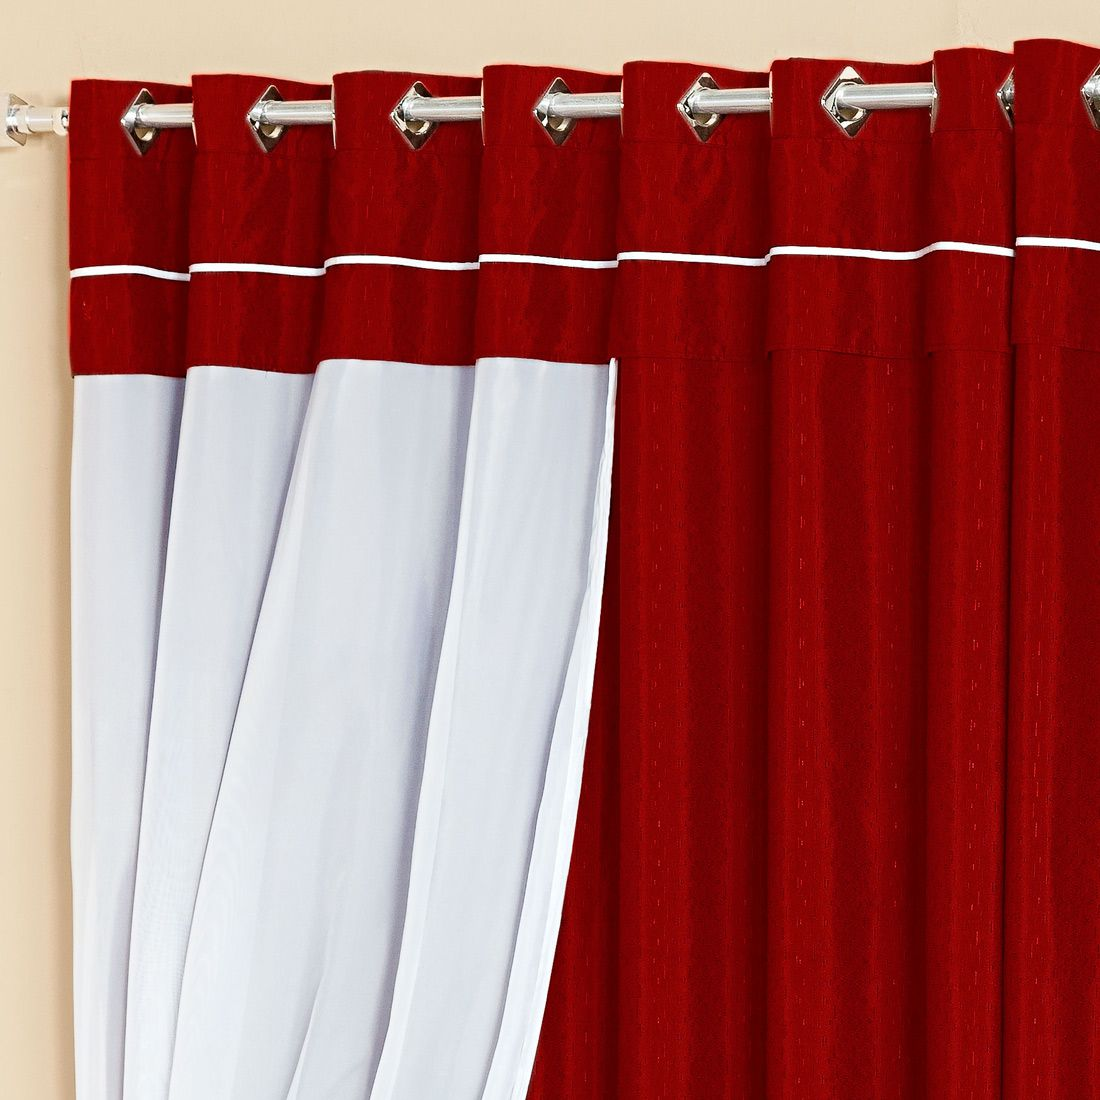 Cortina Lívia Vermelho c/ Voil 3,00m x 2,50m p/ Varão Simples